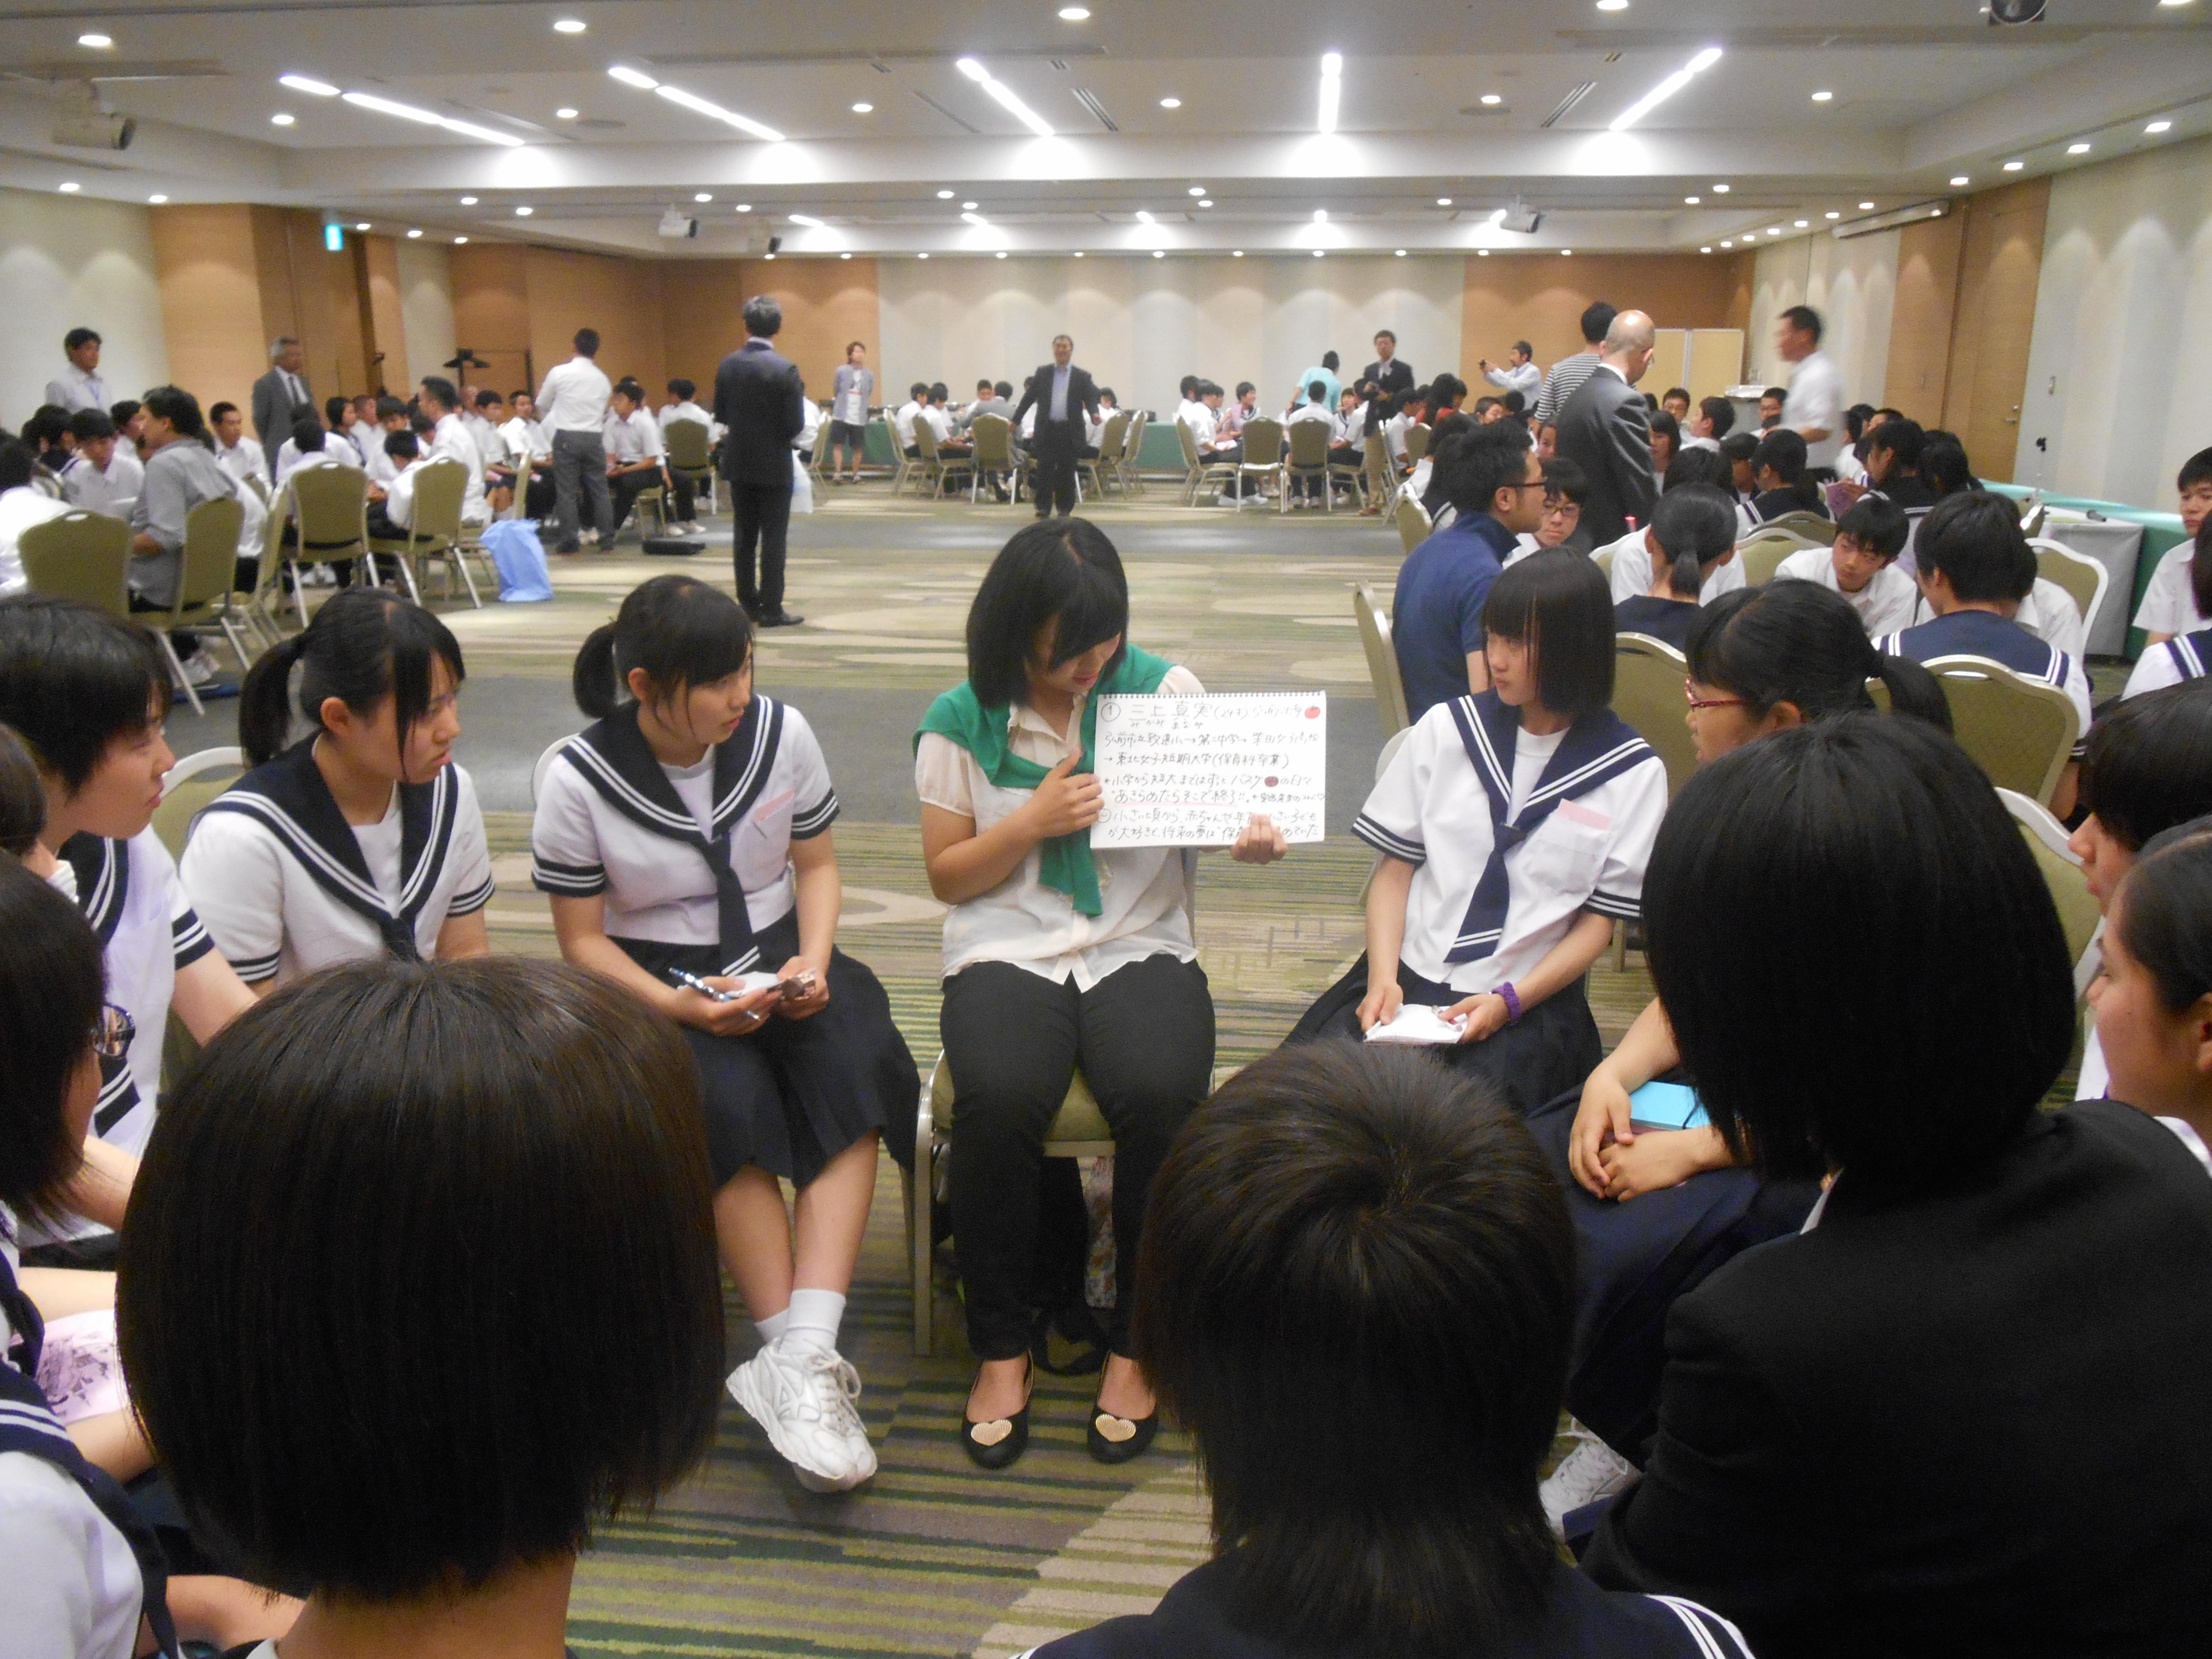 DSCN4407 - AOsuki主催:青森市内の中学校(修学旅行)に夢を与える時間